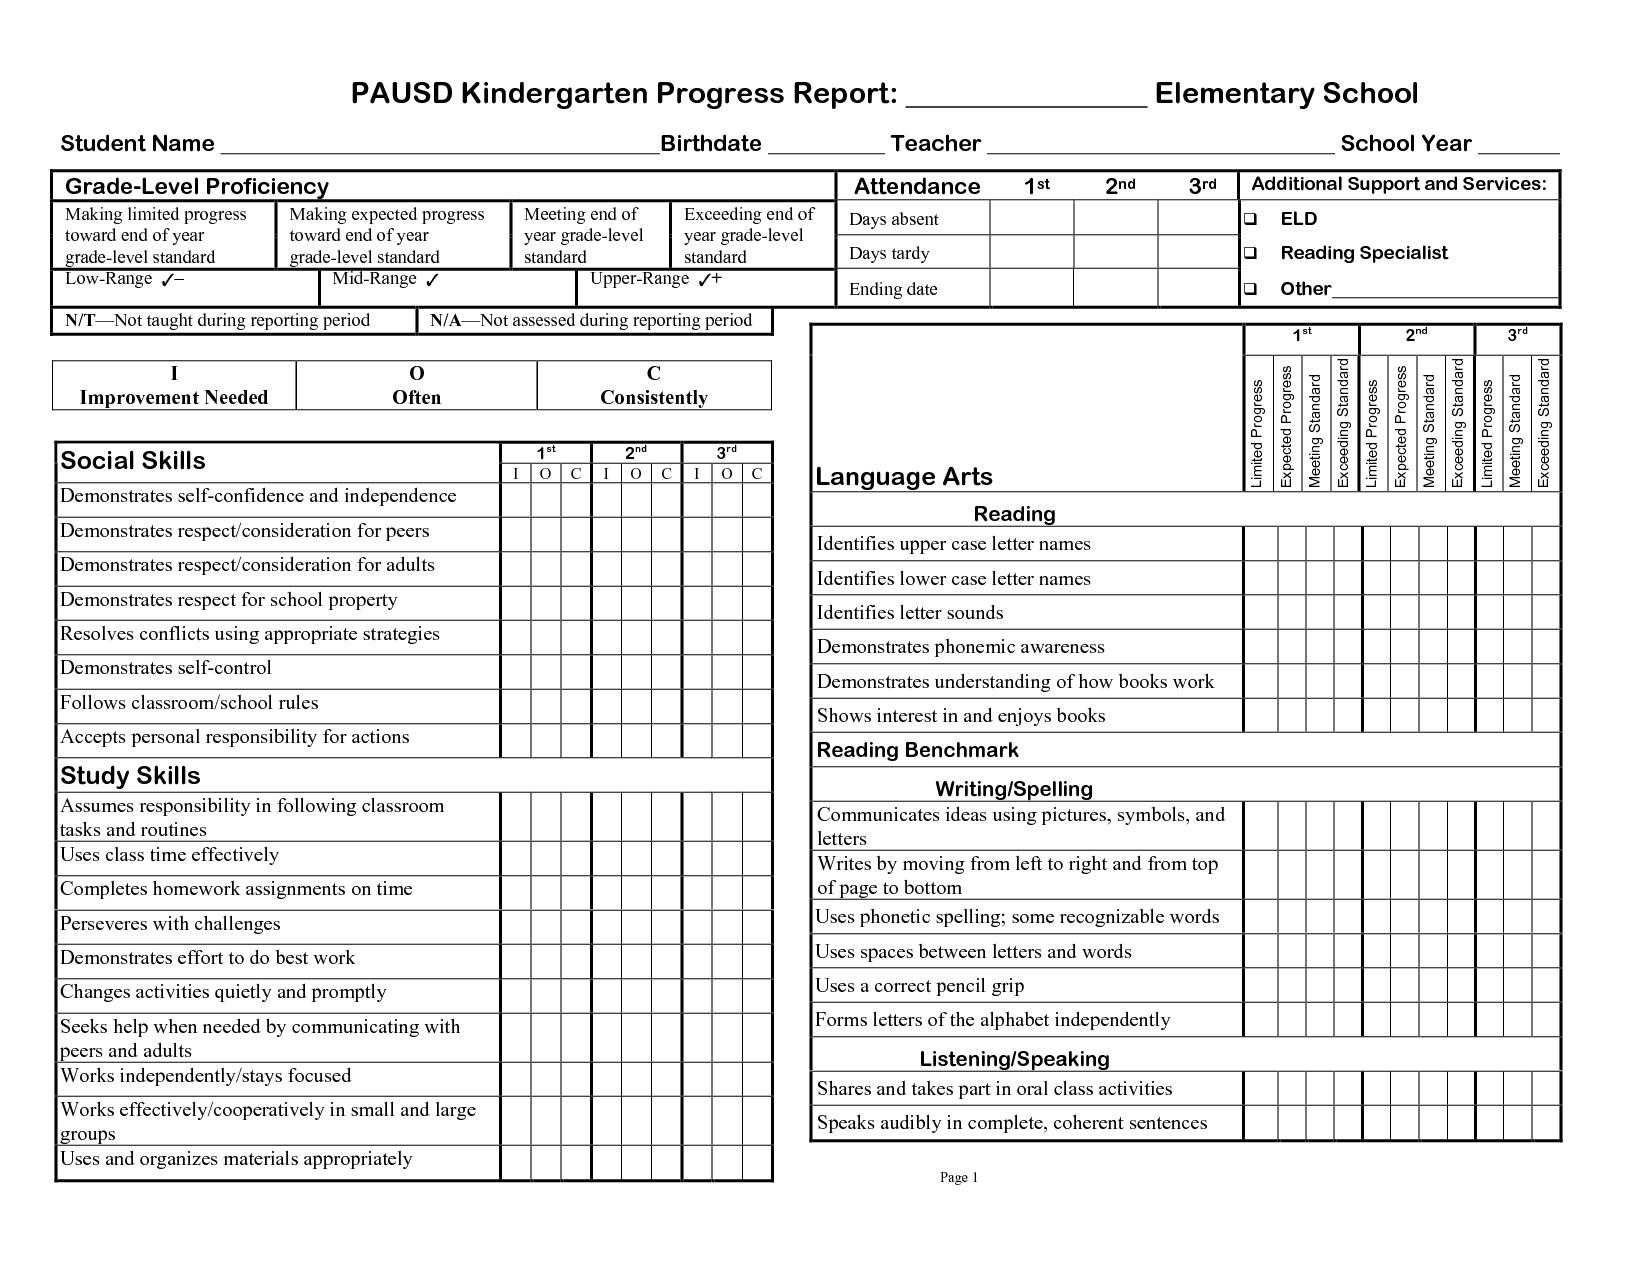 Kindergarten Social Skills Progress Report Blank Templates within Character Report Card Template